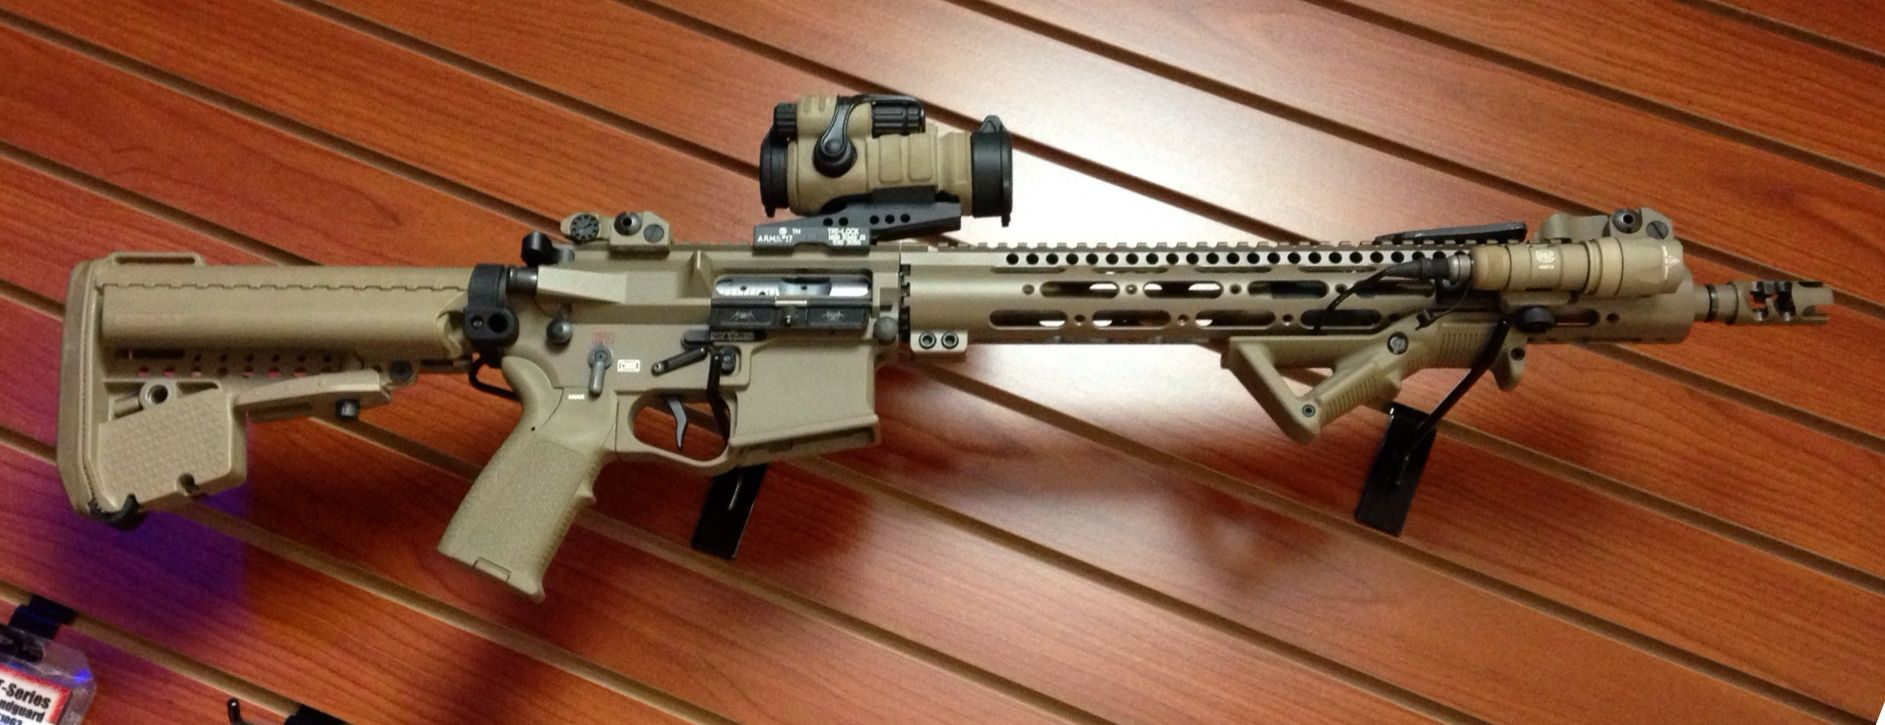 Custom AR15 cerakoted in Magpull FDE | Guns | Guns, Tactical